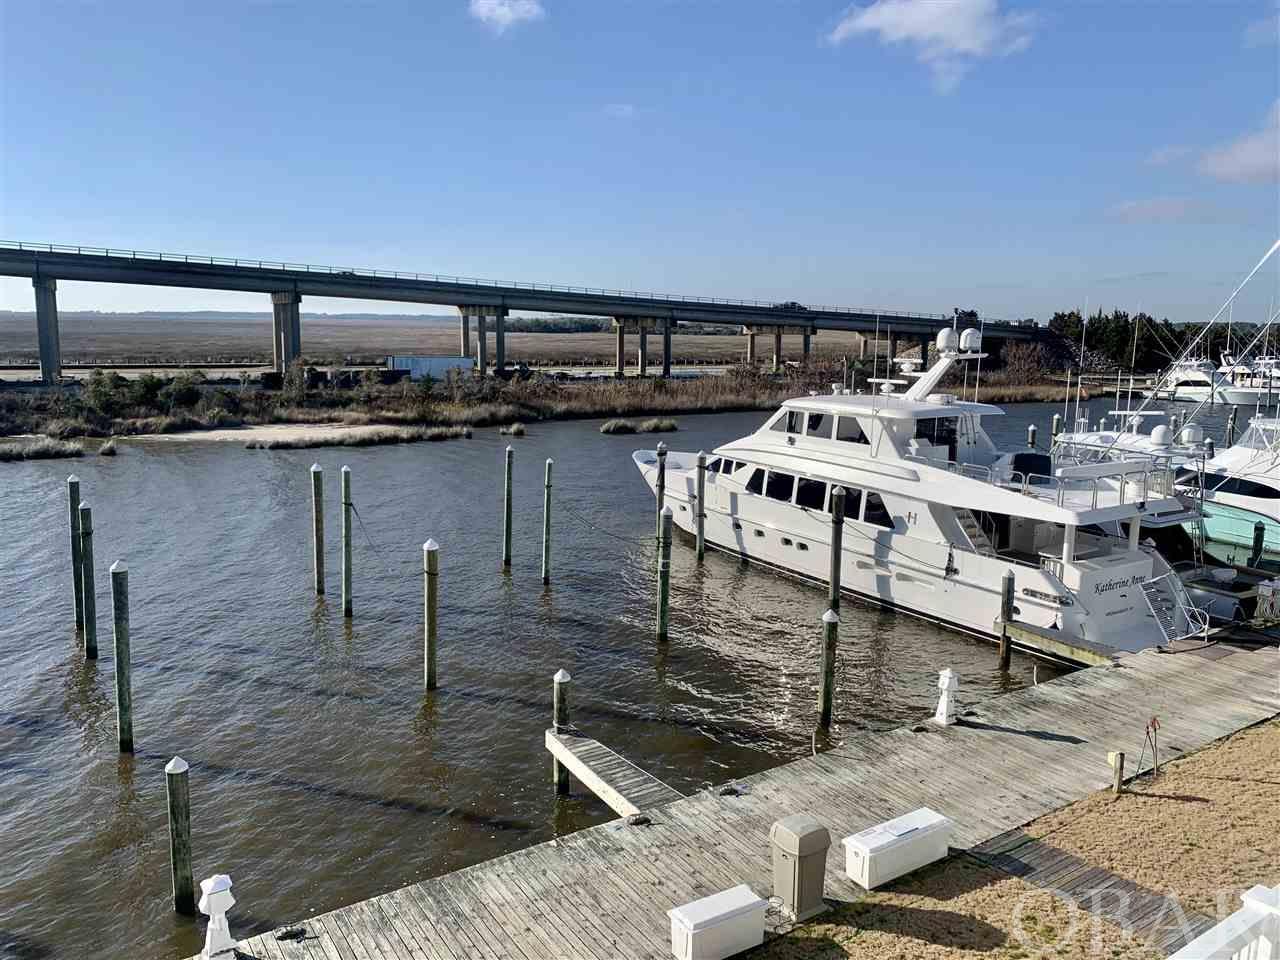 403-sailfish-drive-unit-403-manteo-nc-27954